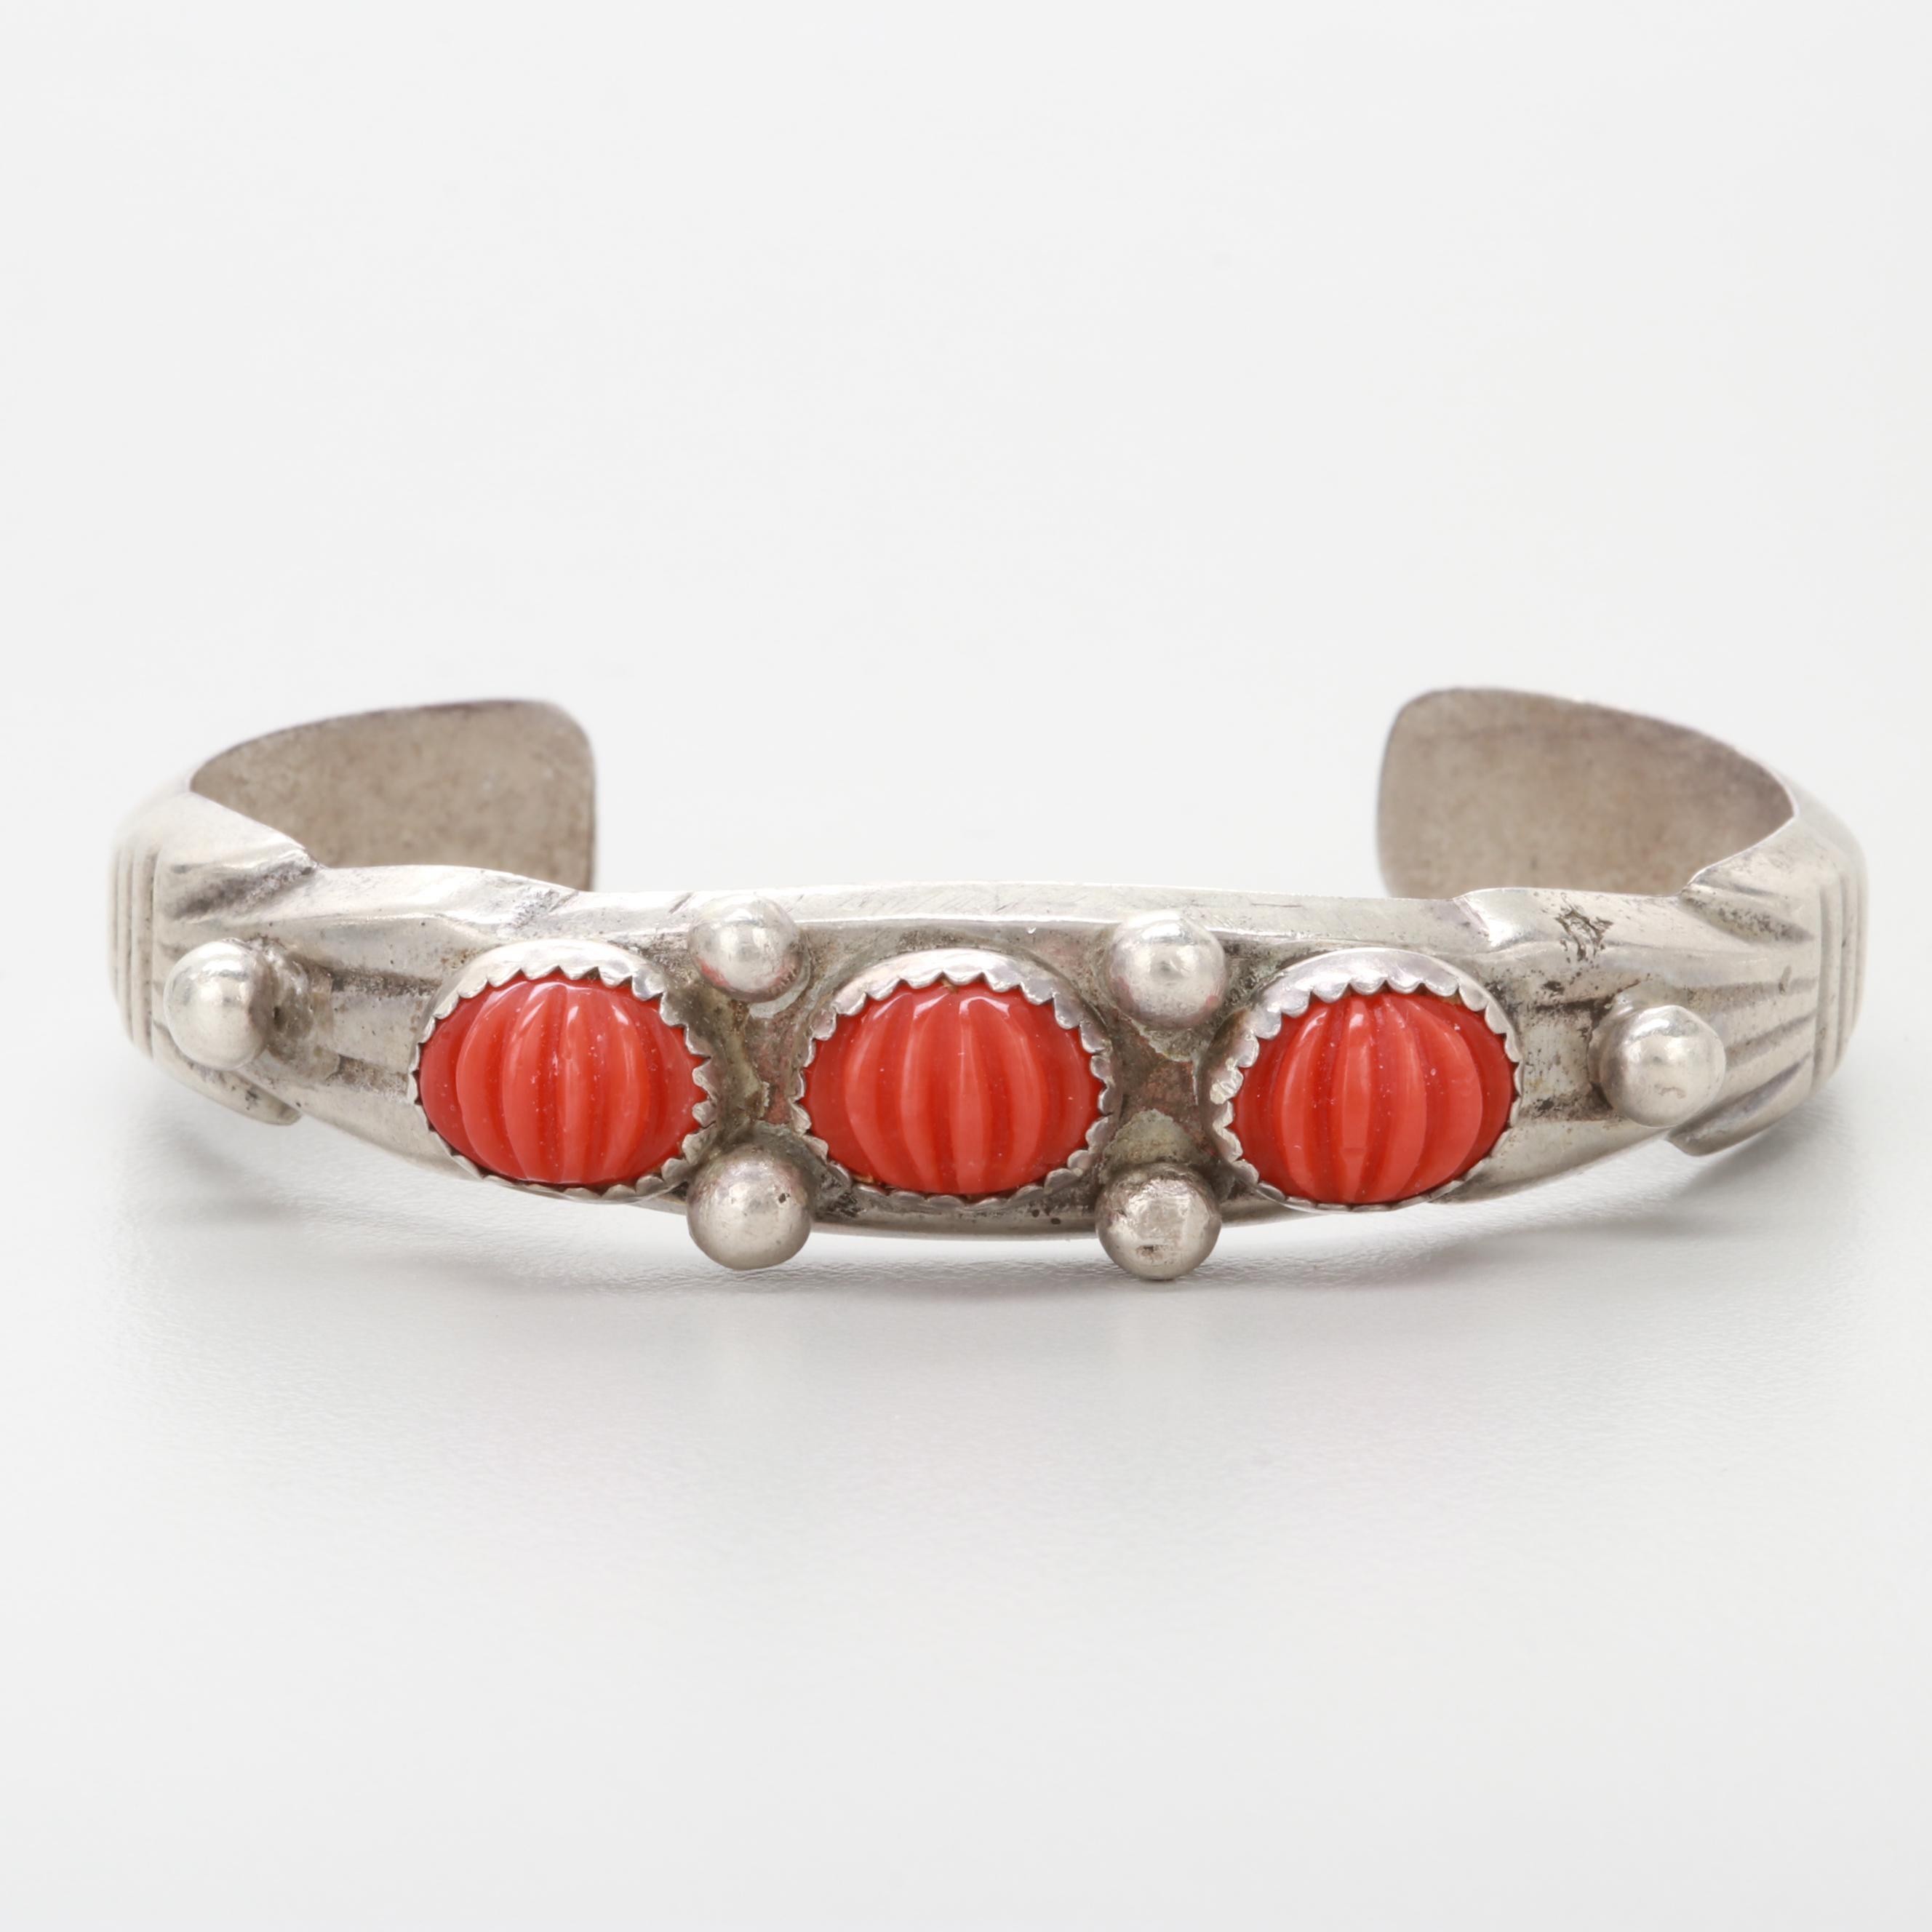 Southwestern Style Sterling Silver Carved Coral Cuff Bracelet